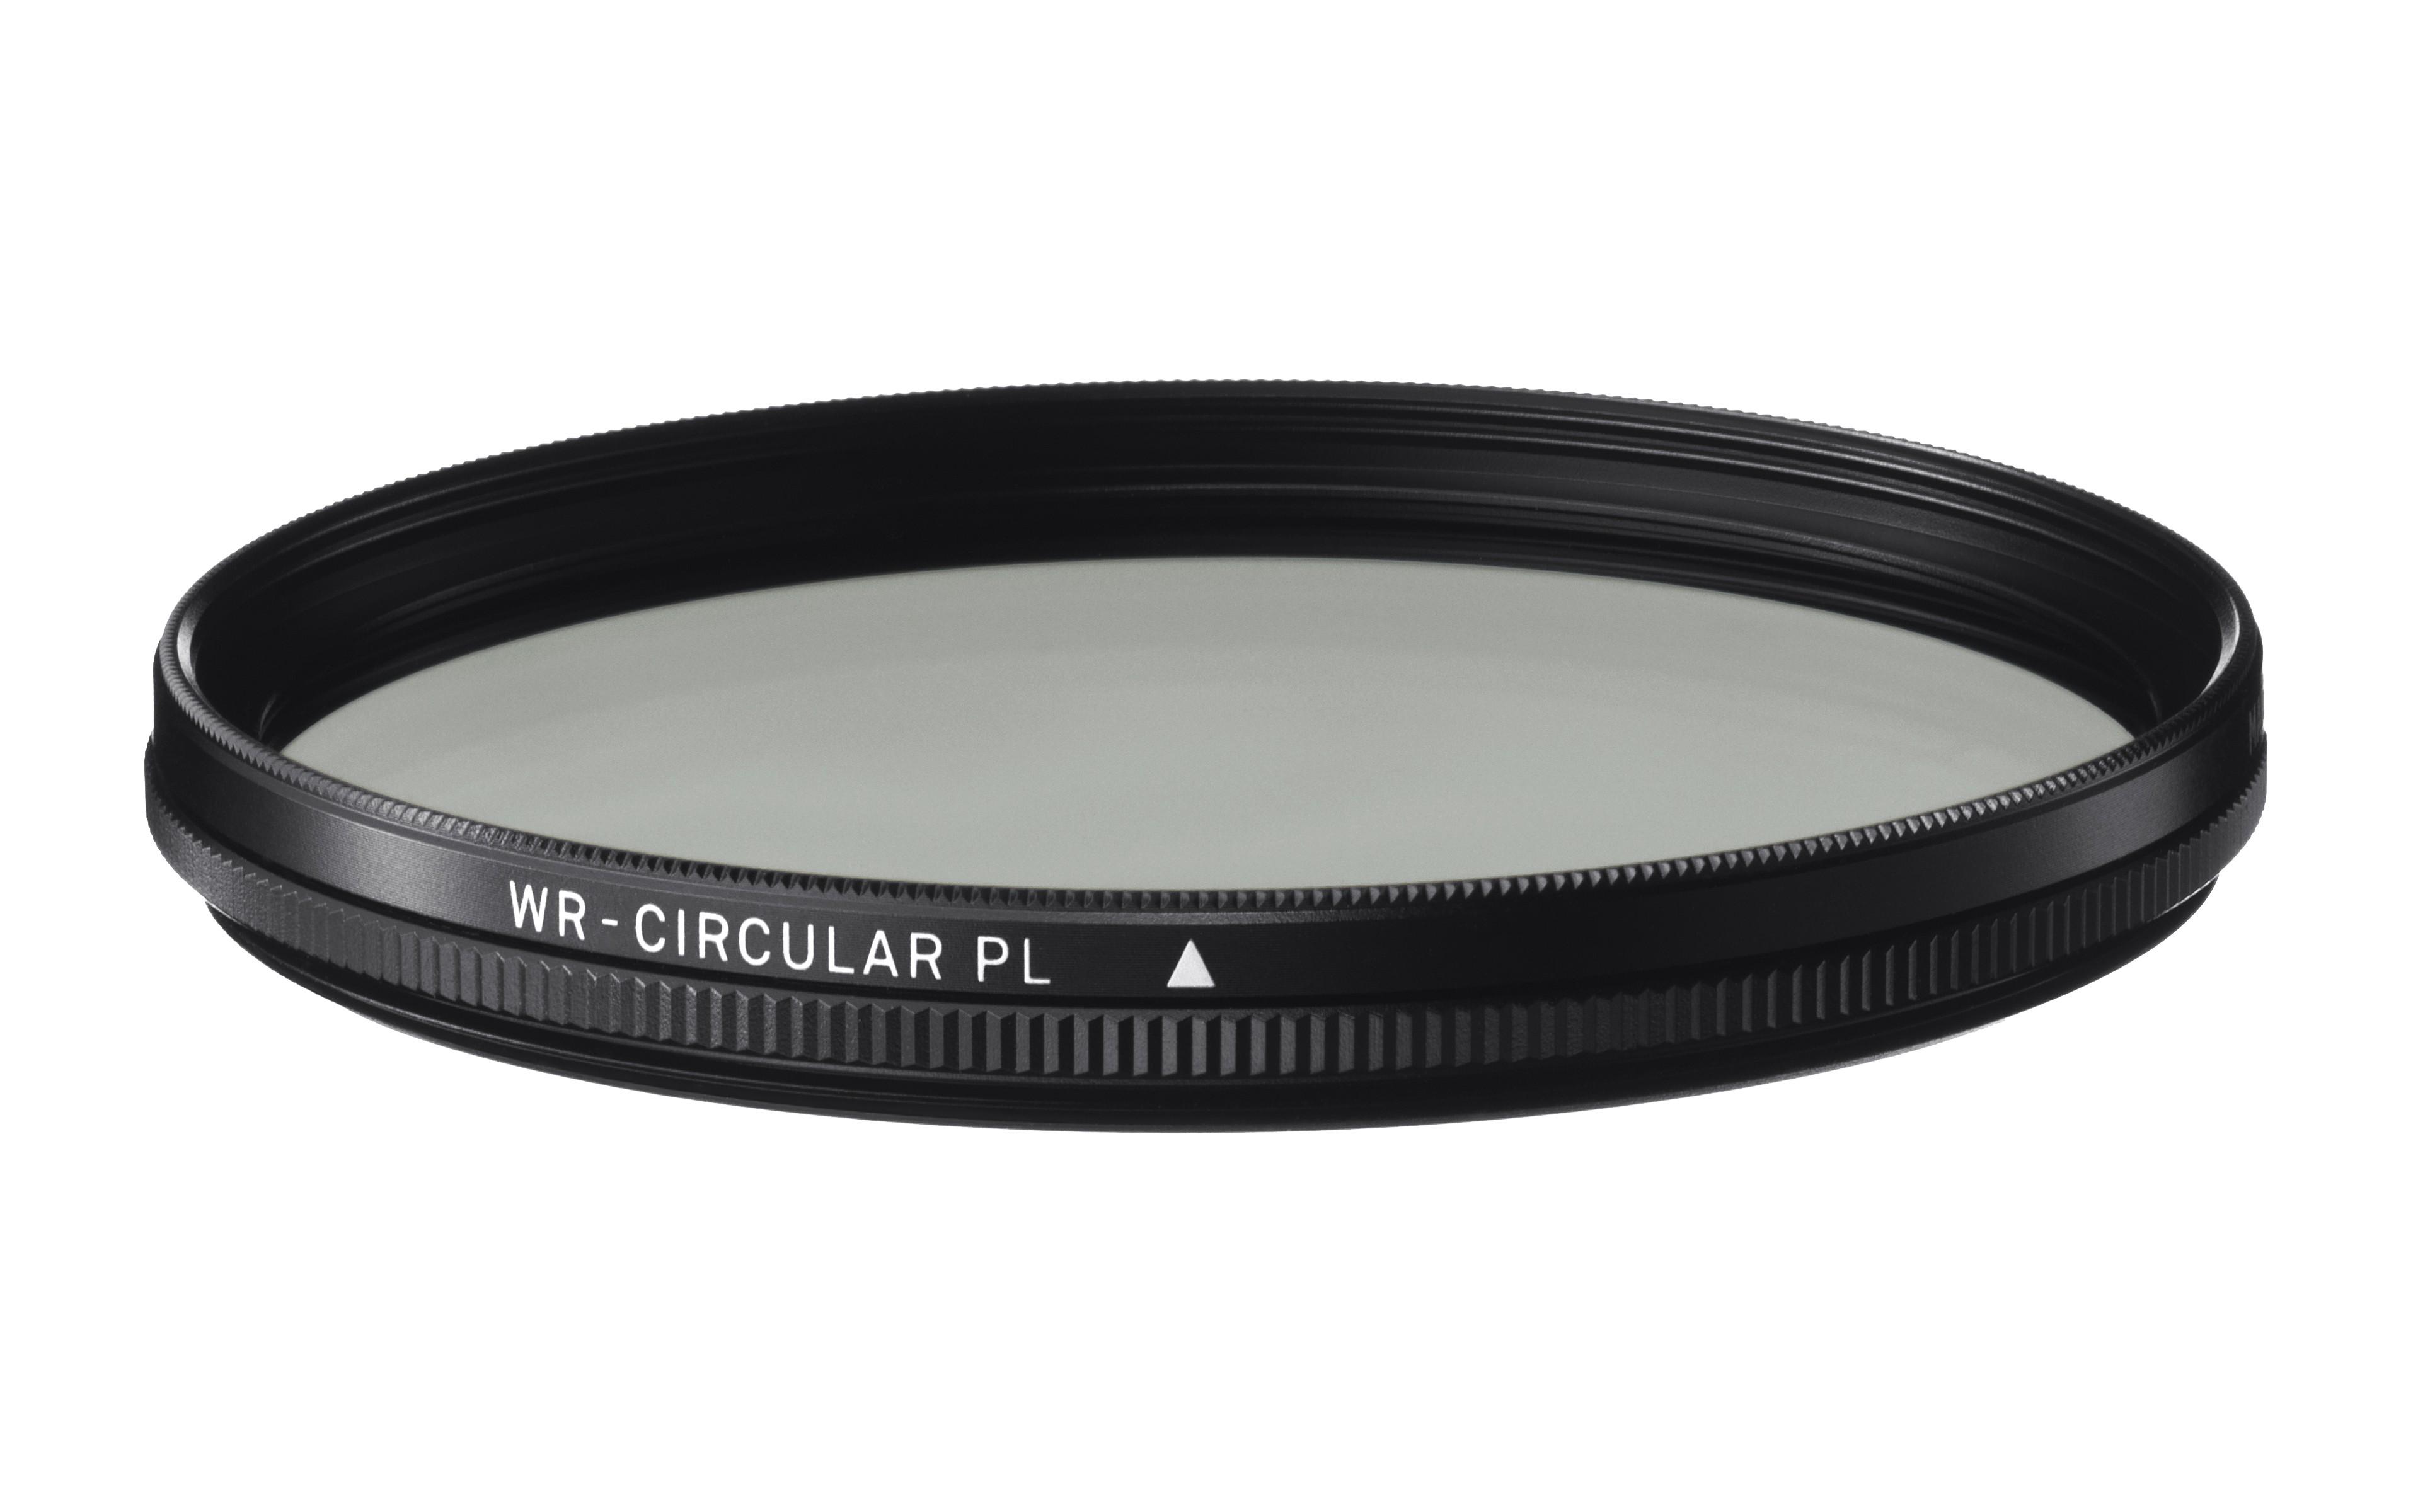 58mm Circular Polarizing Filter, fit most Canon and Nikon Kit Lenses